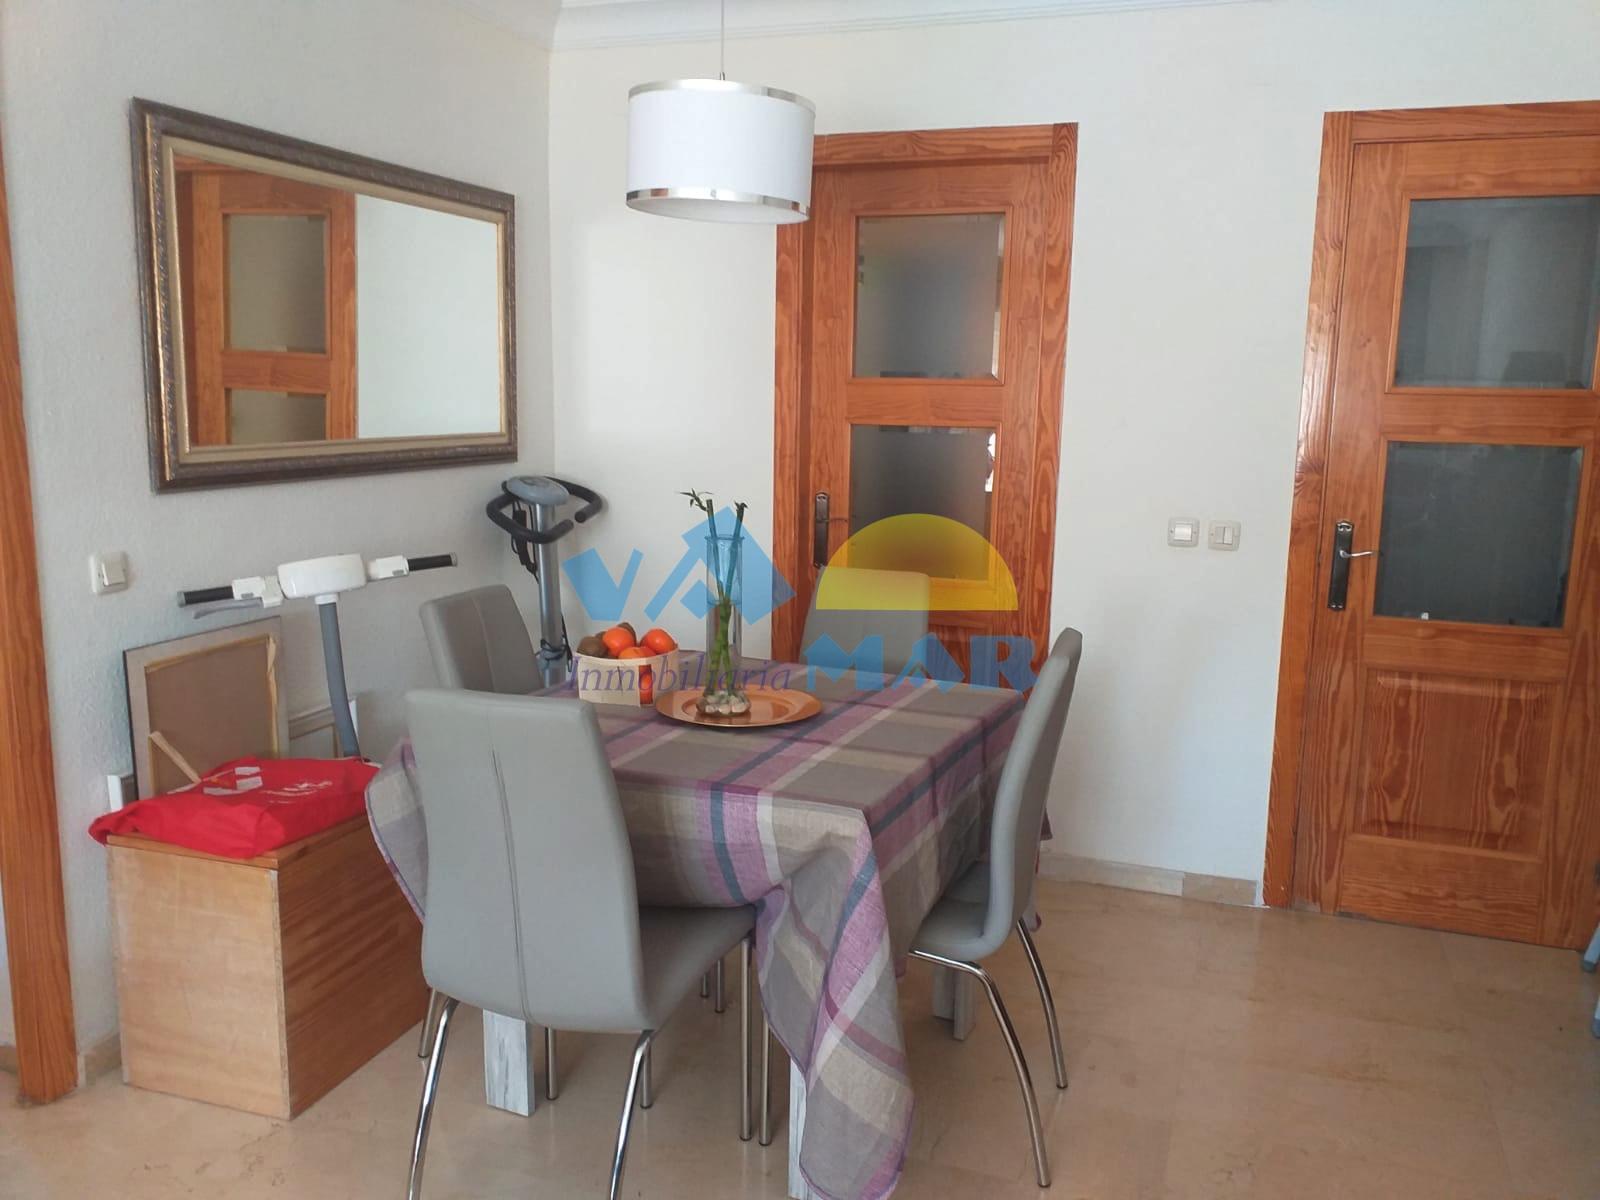 Estupendo piso en Estepona